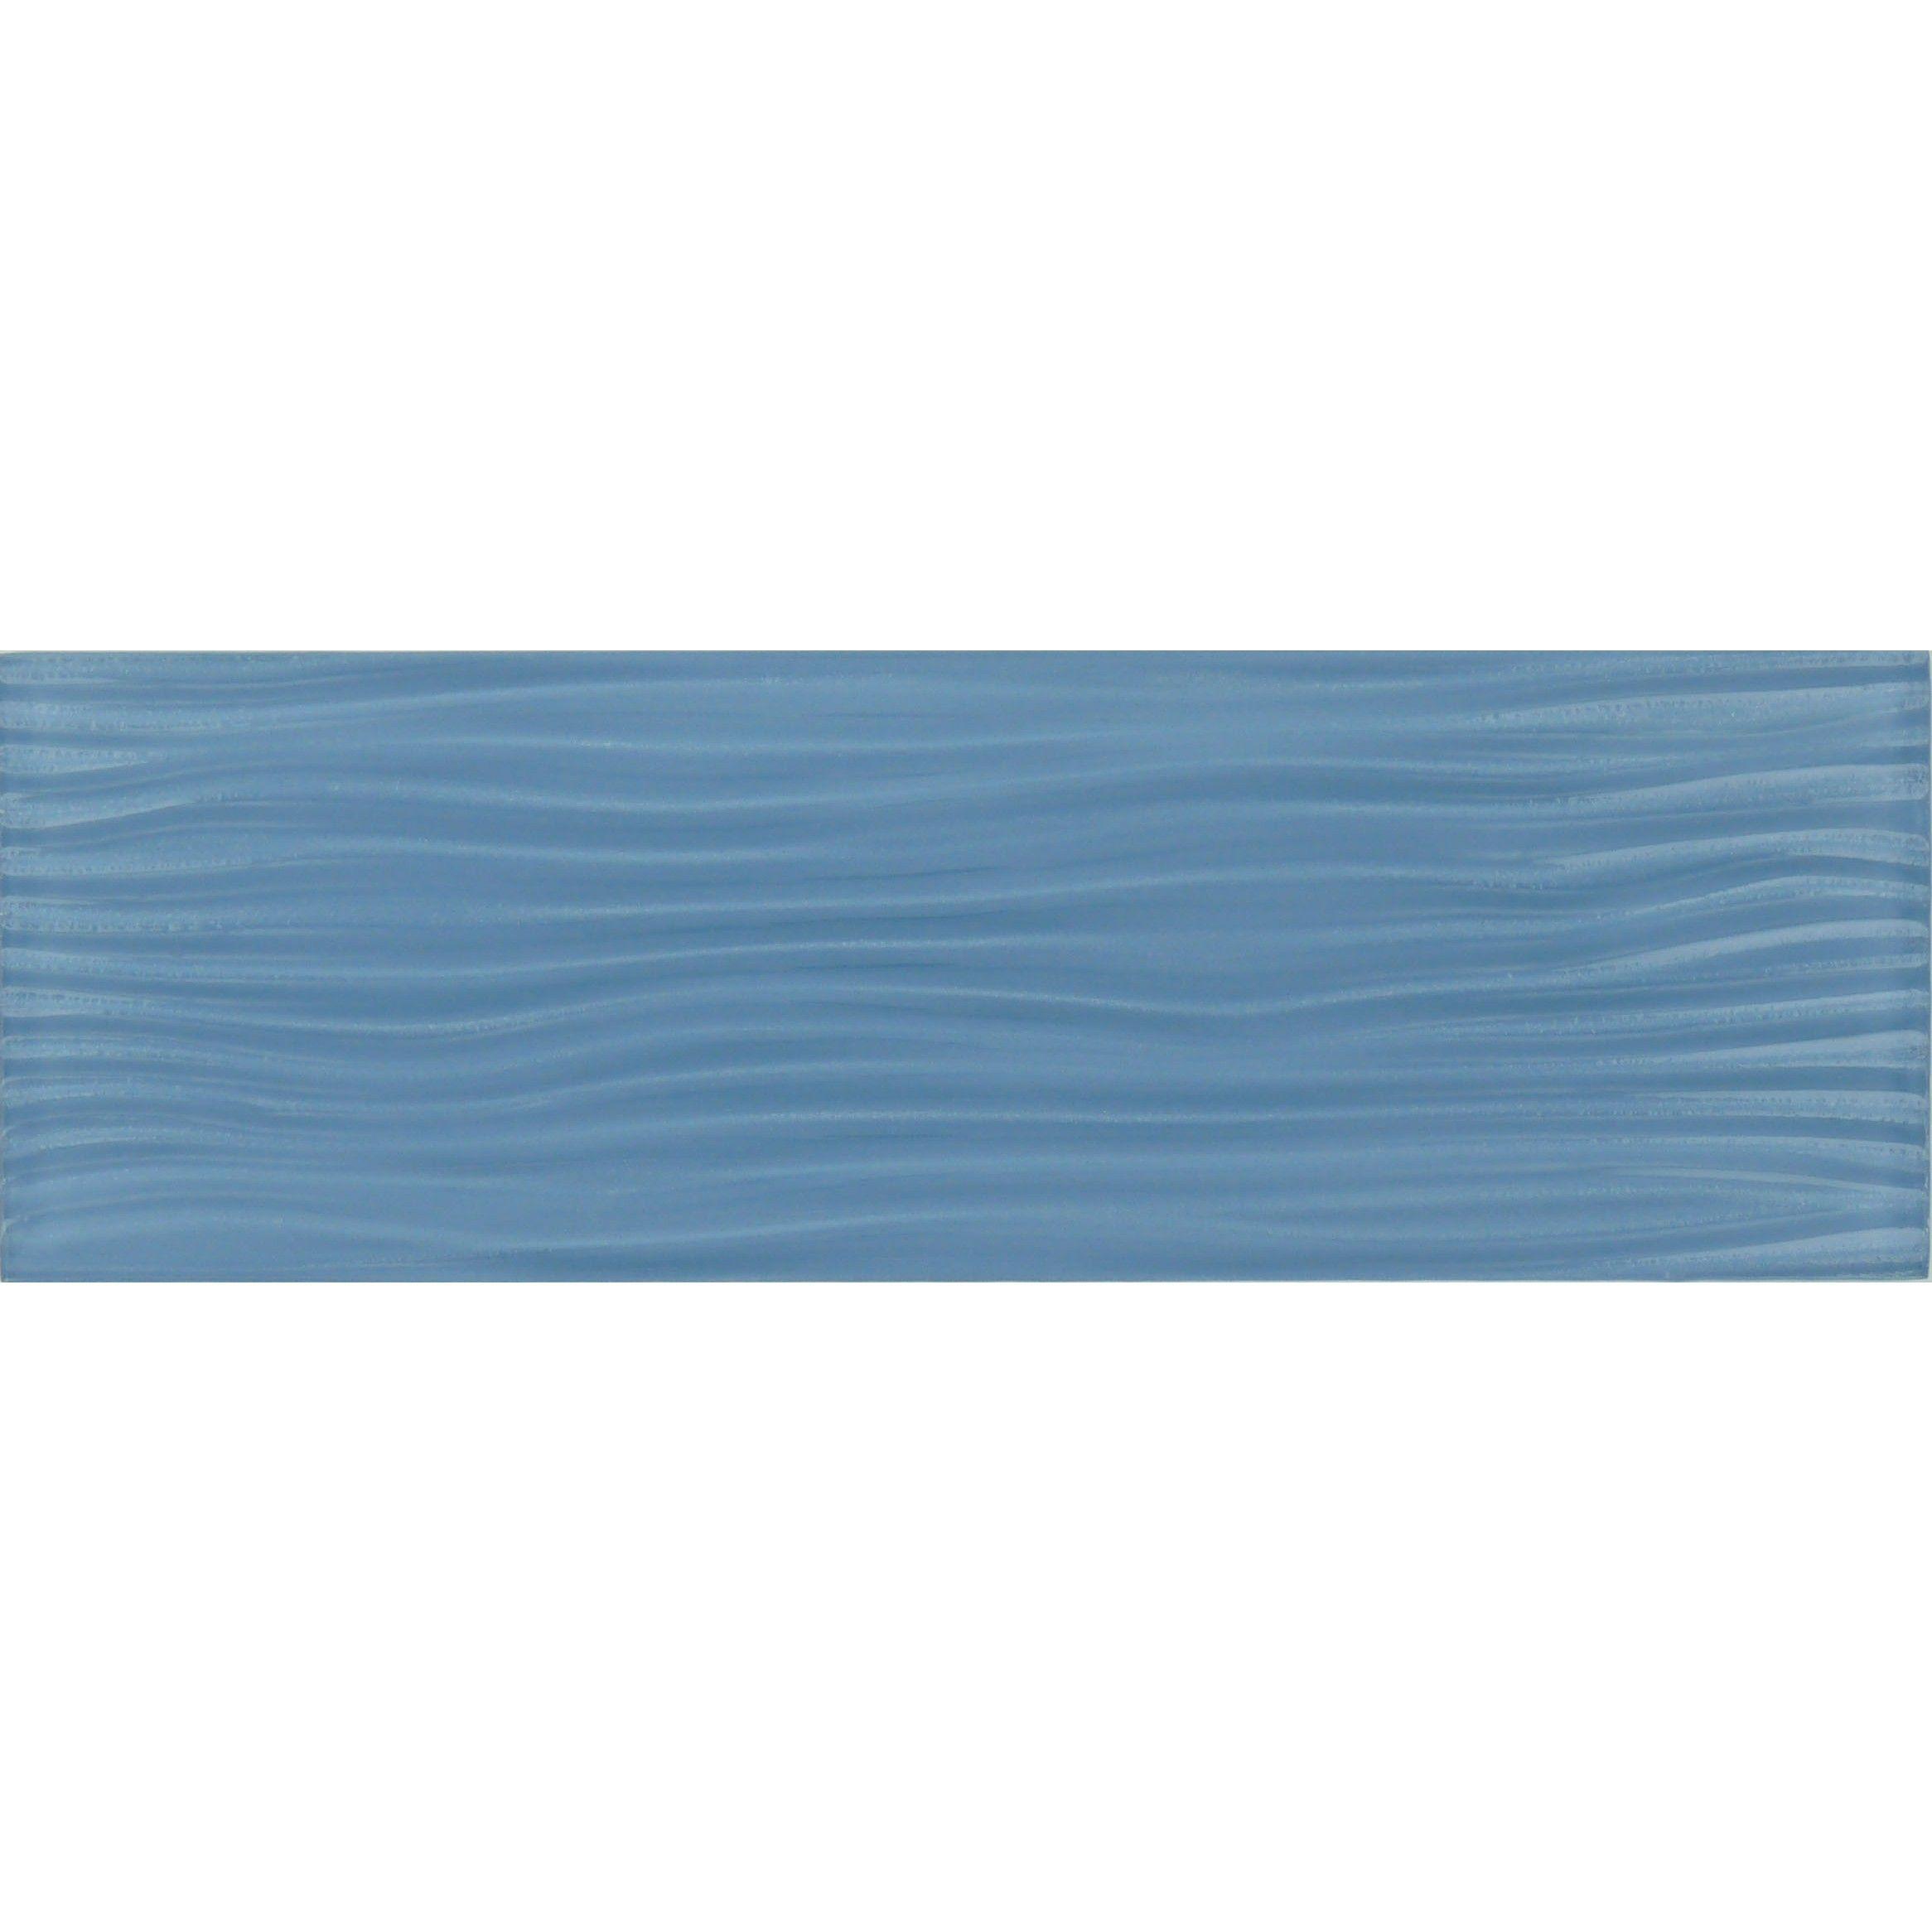 4 X 12 Blue Glass Subway Tile Glossy C10 W Wave Glass Glass Subway Tile Subway Tile